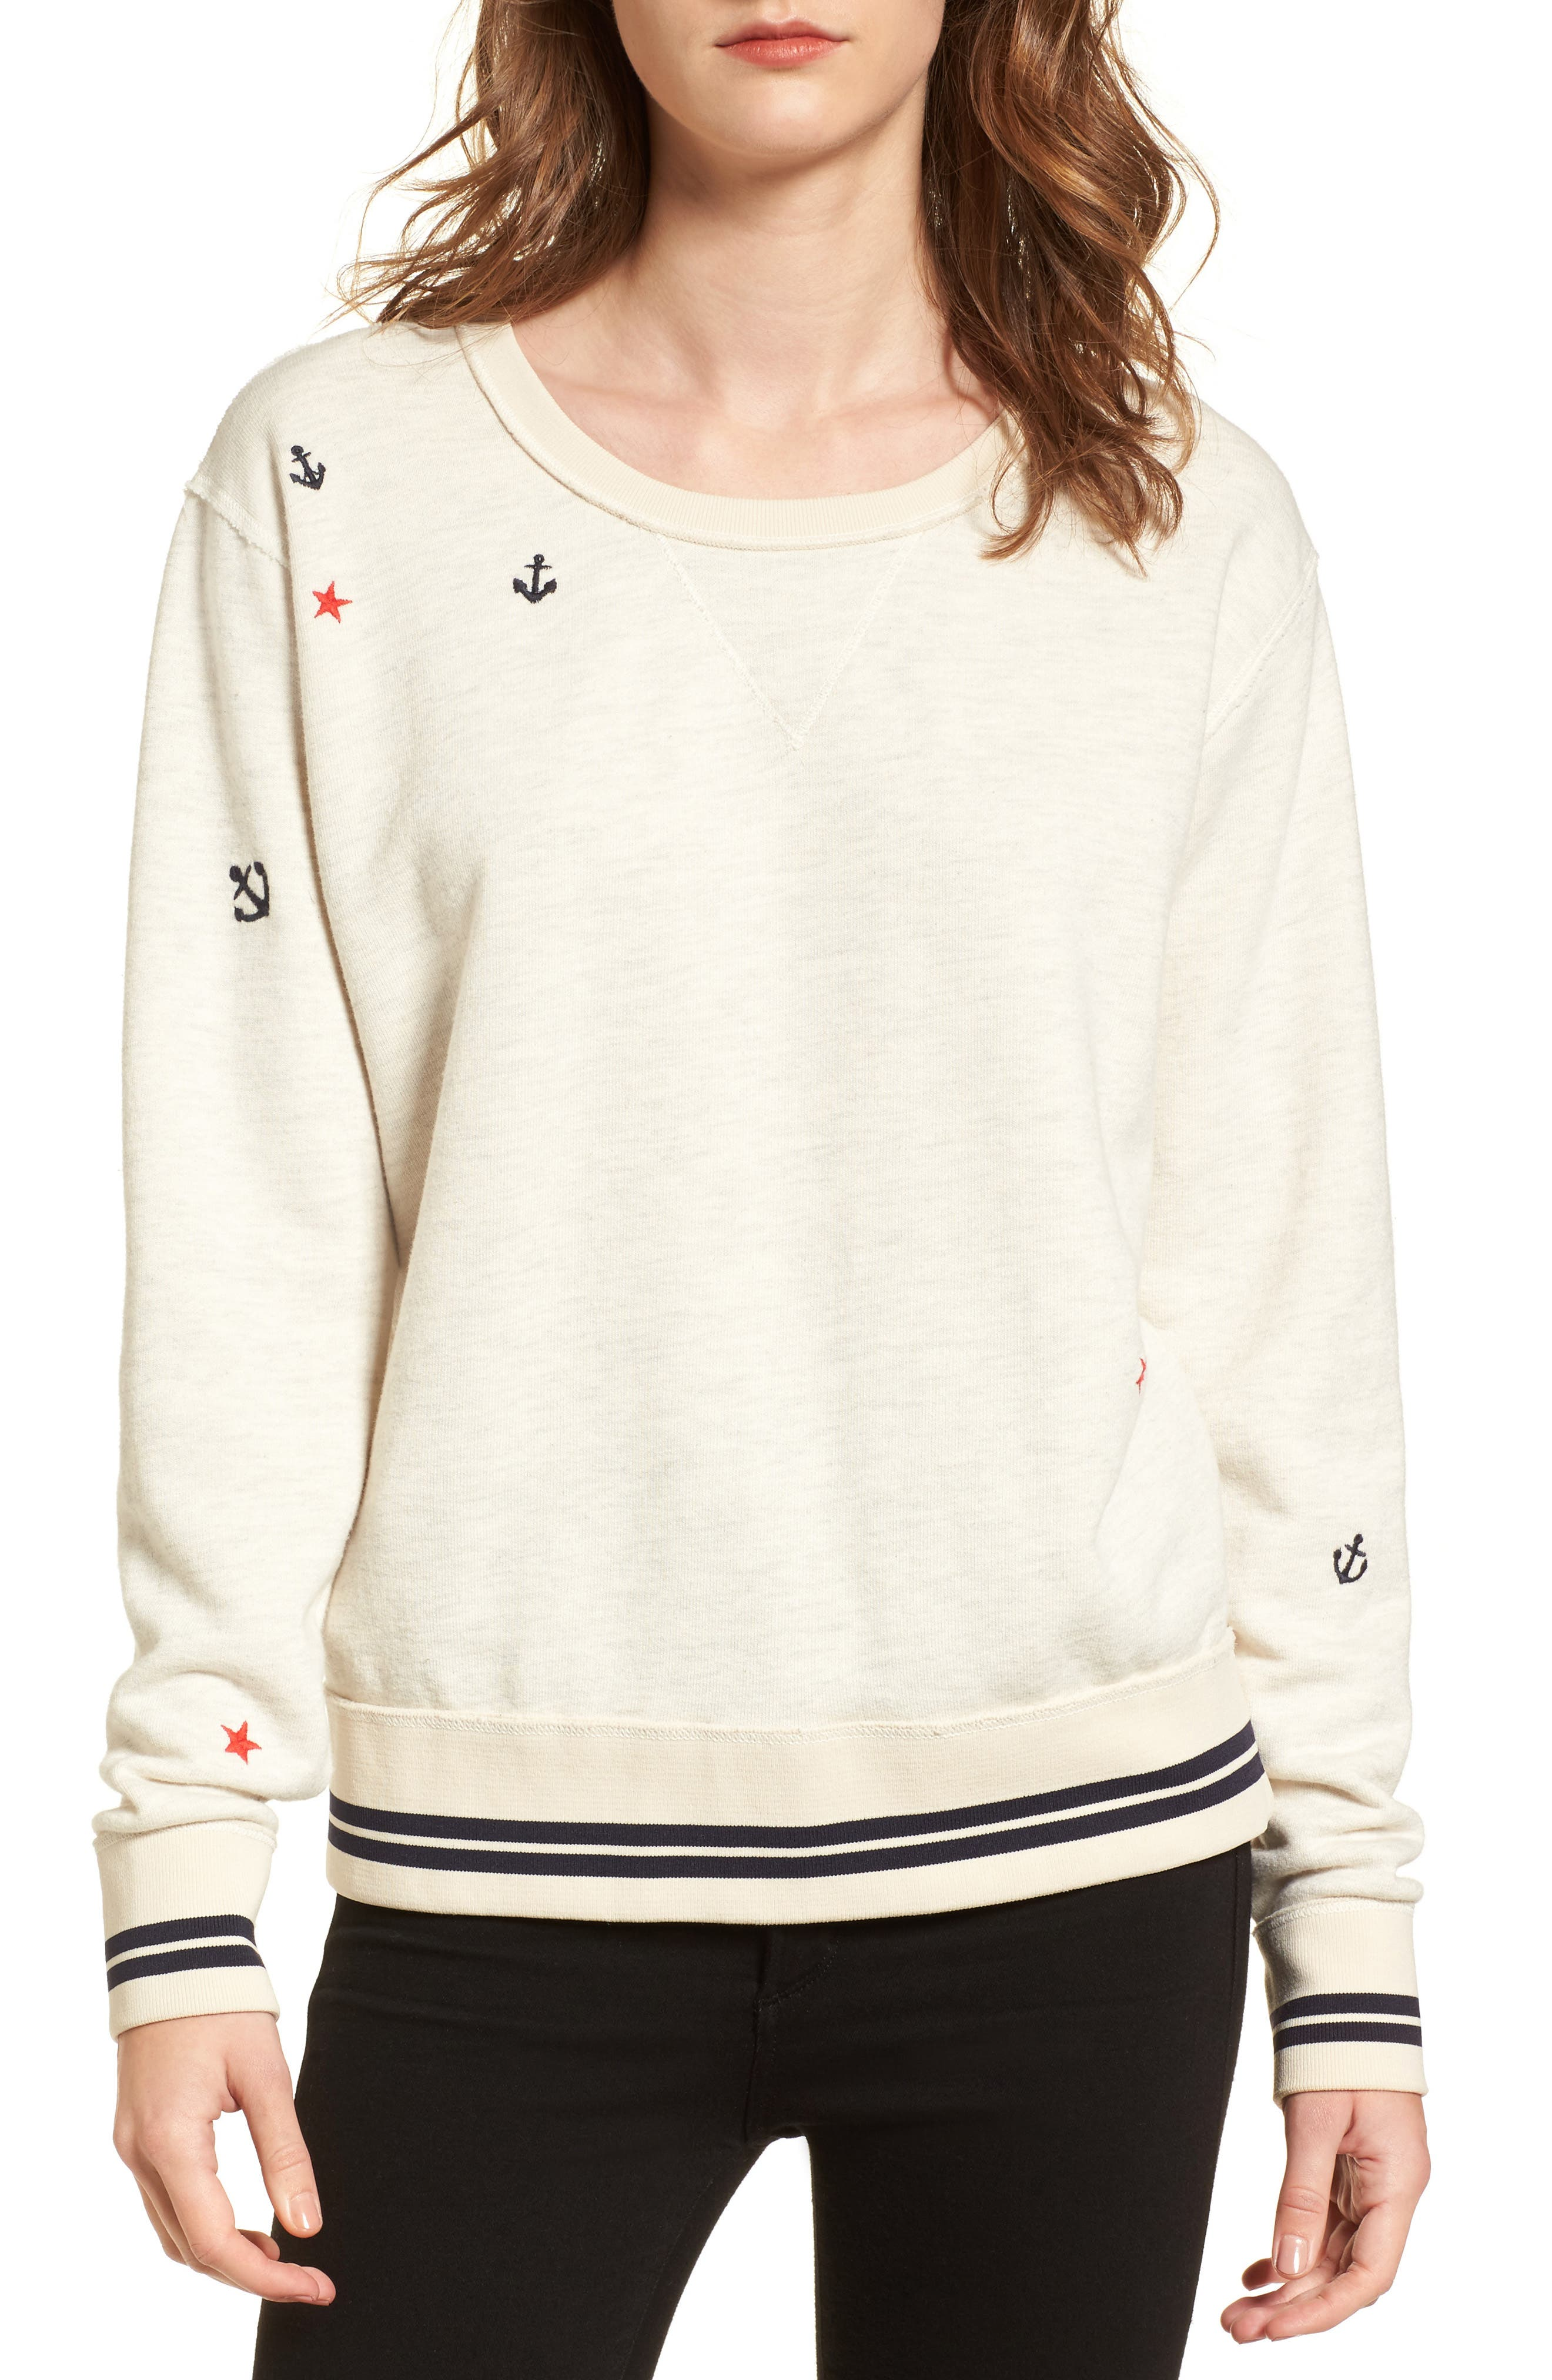 Main Image - Scotch & Soda Nautical Sweatshirt